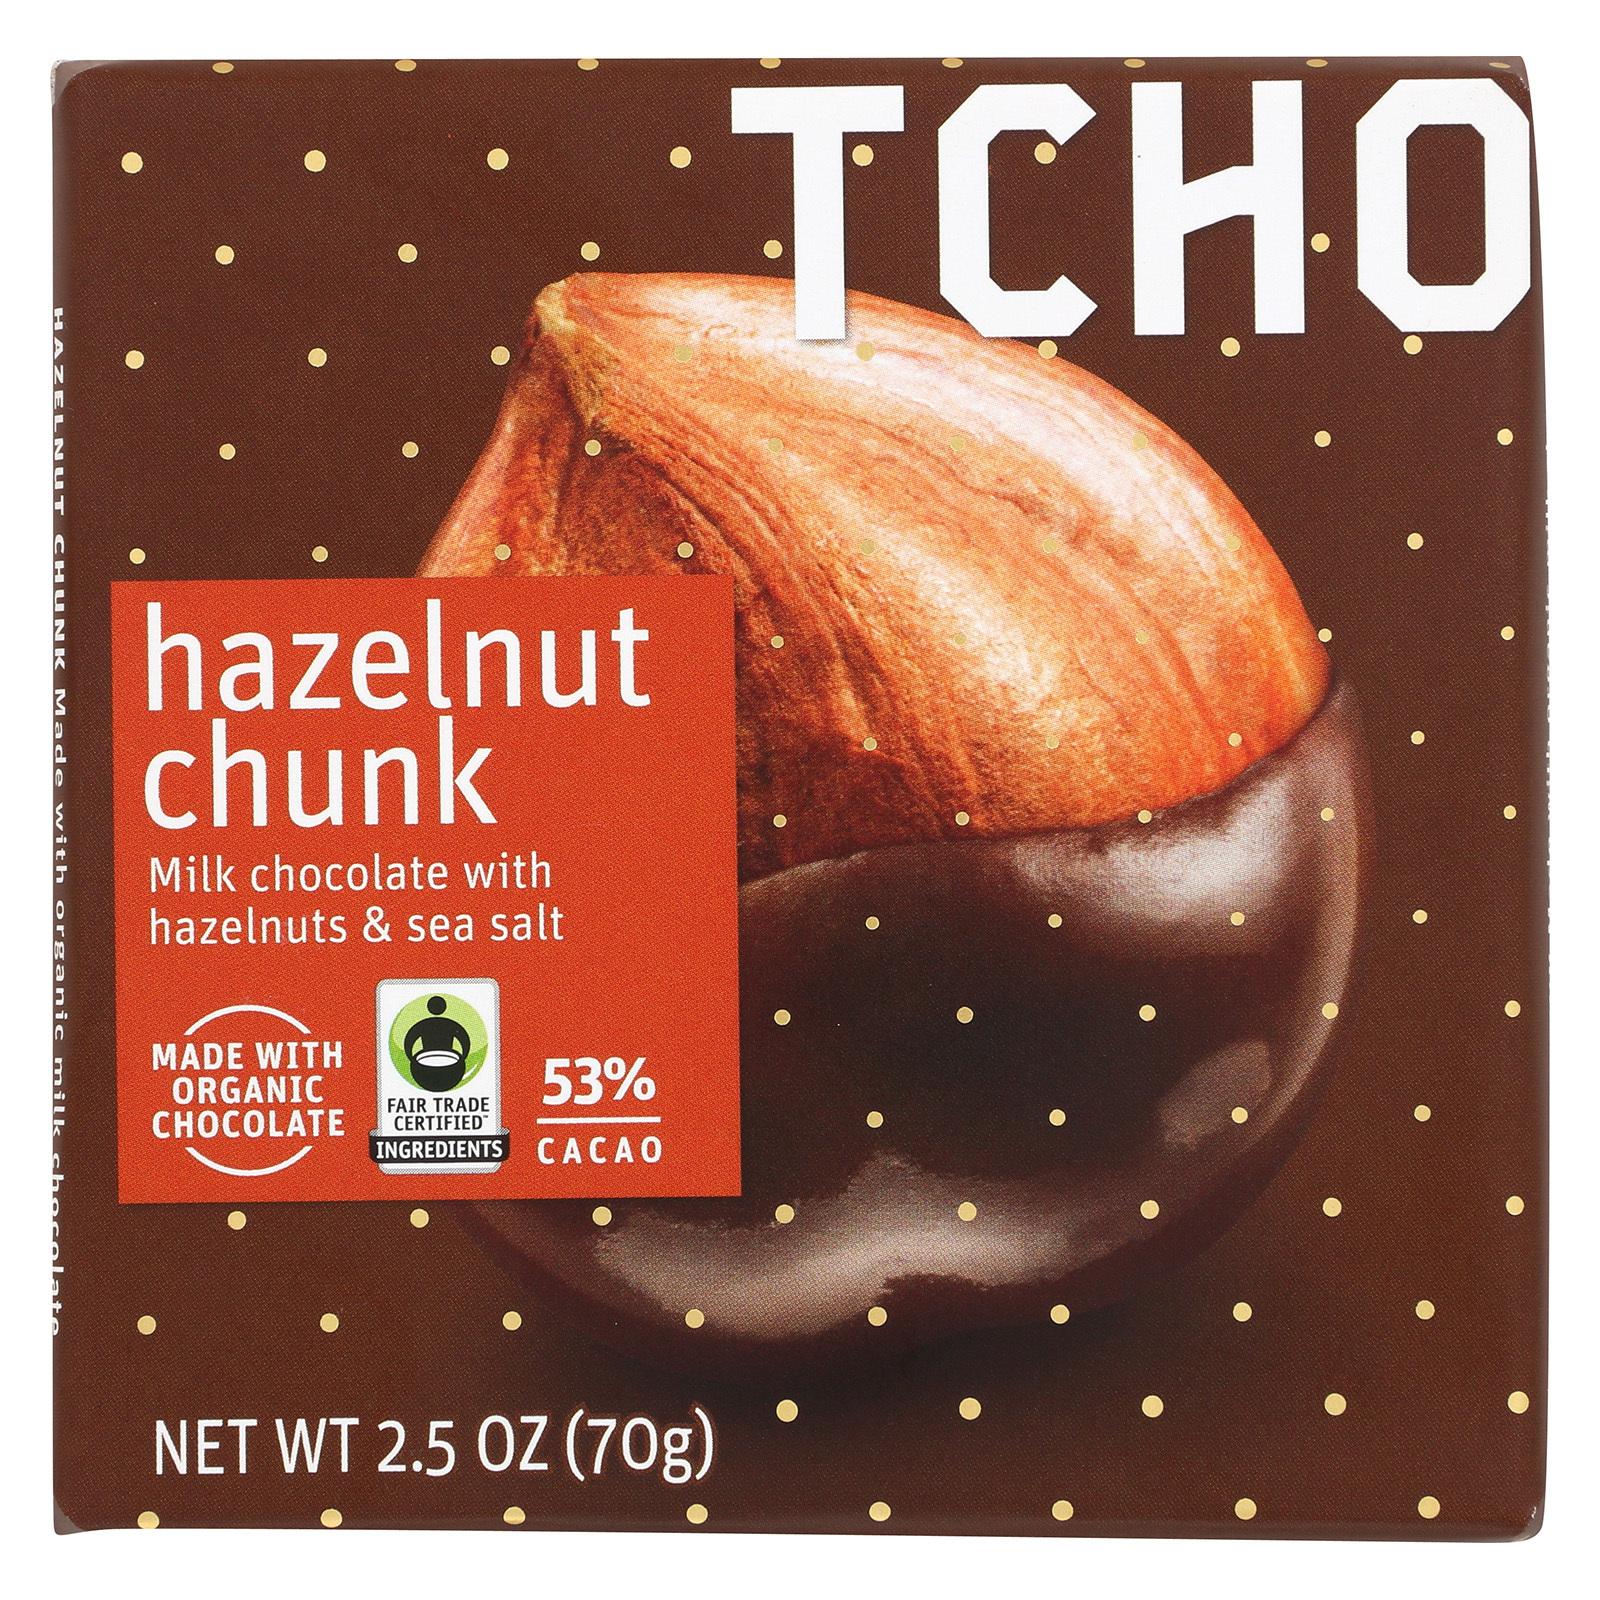 Tcho Chocolate Milk Chocolate Bar - Hazelnut Chunk - Case of 12 - 2.5 oz.